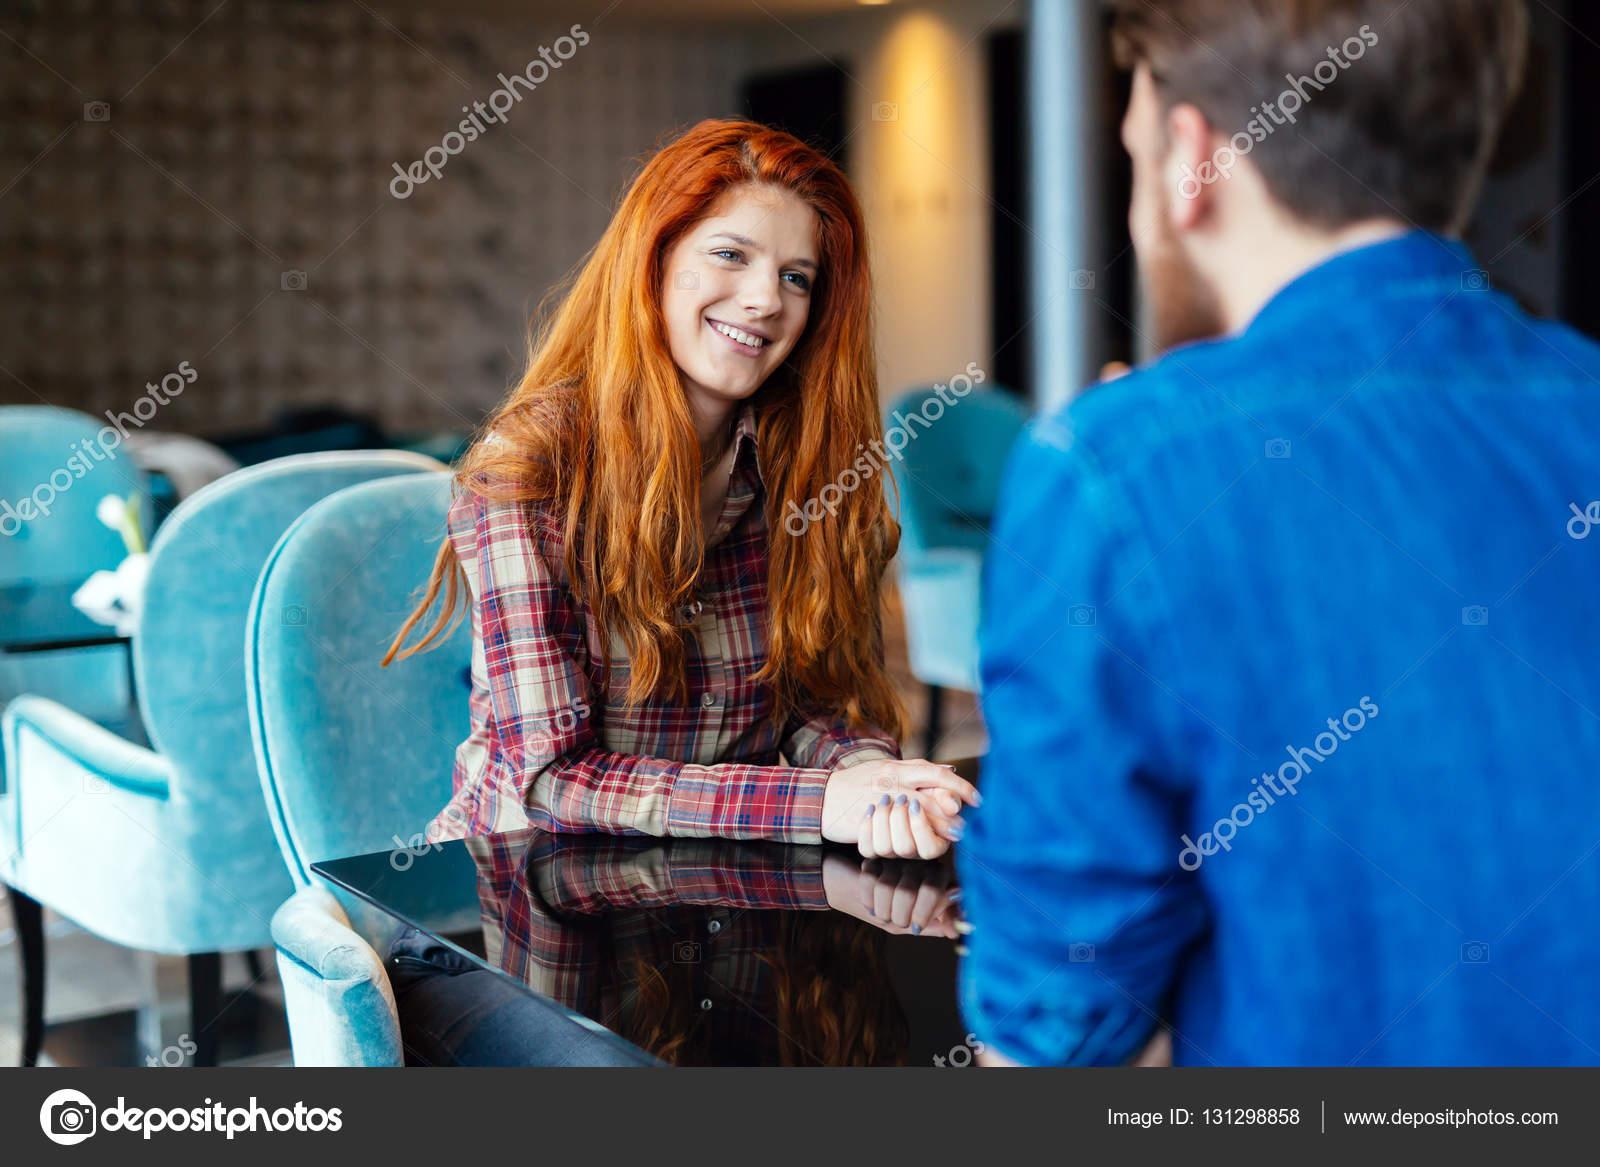 online dating profile strategies